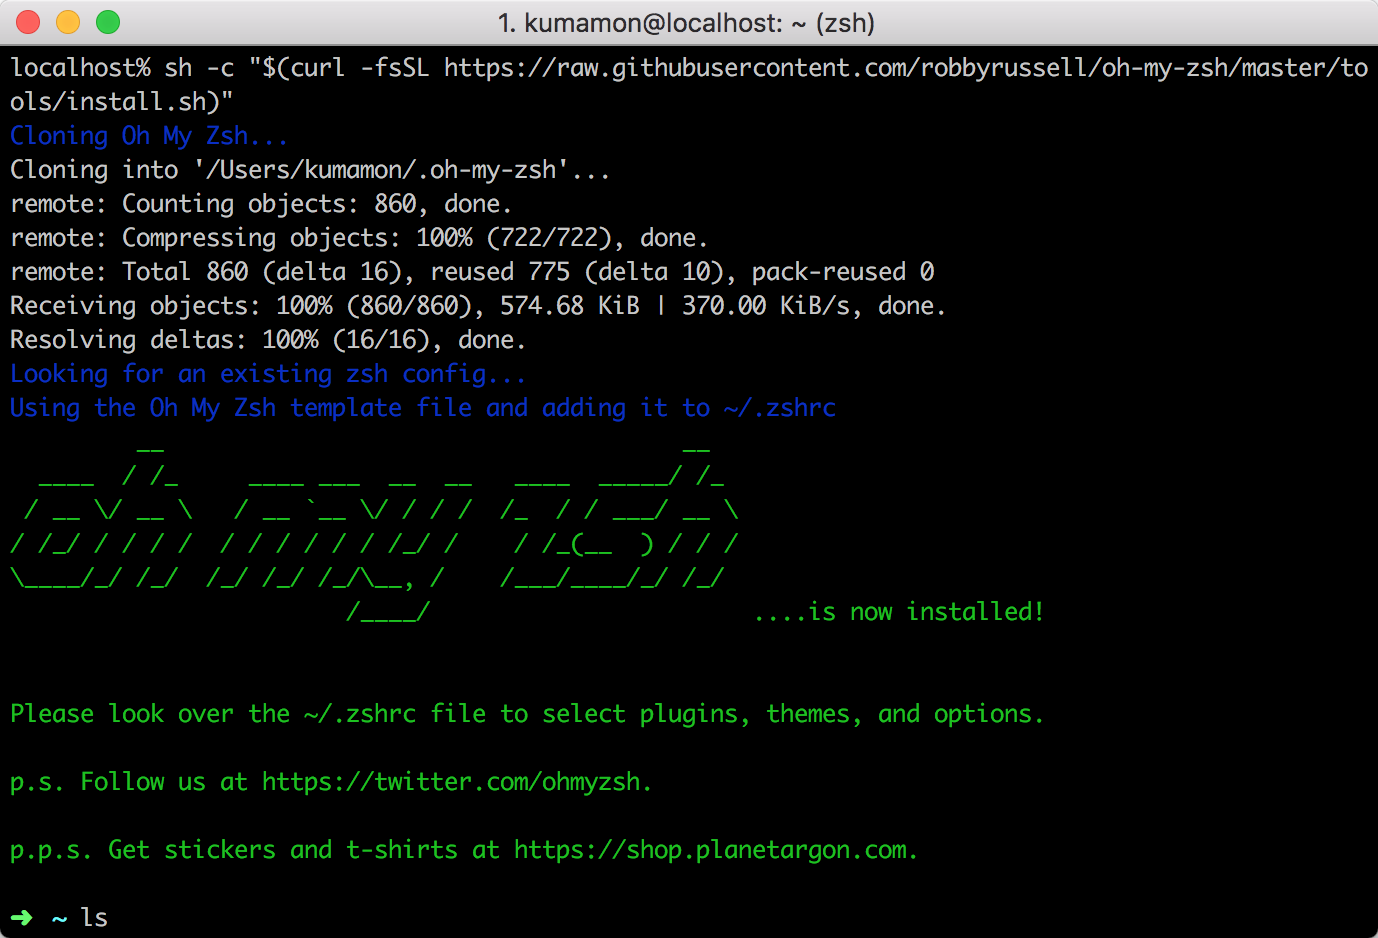 iTerm2 + Oh My Zsh 打造MAC舒适终端体验